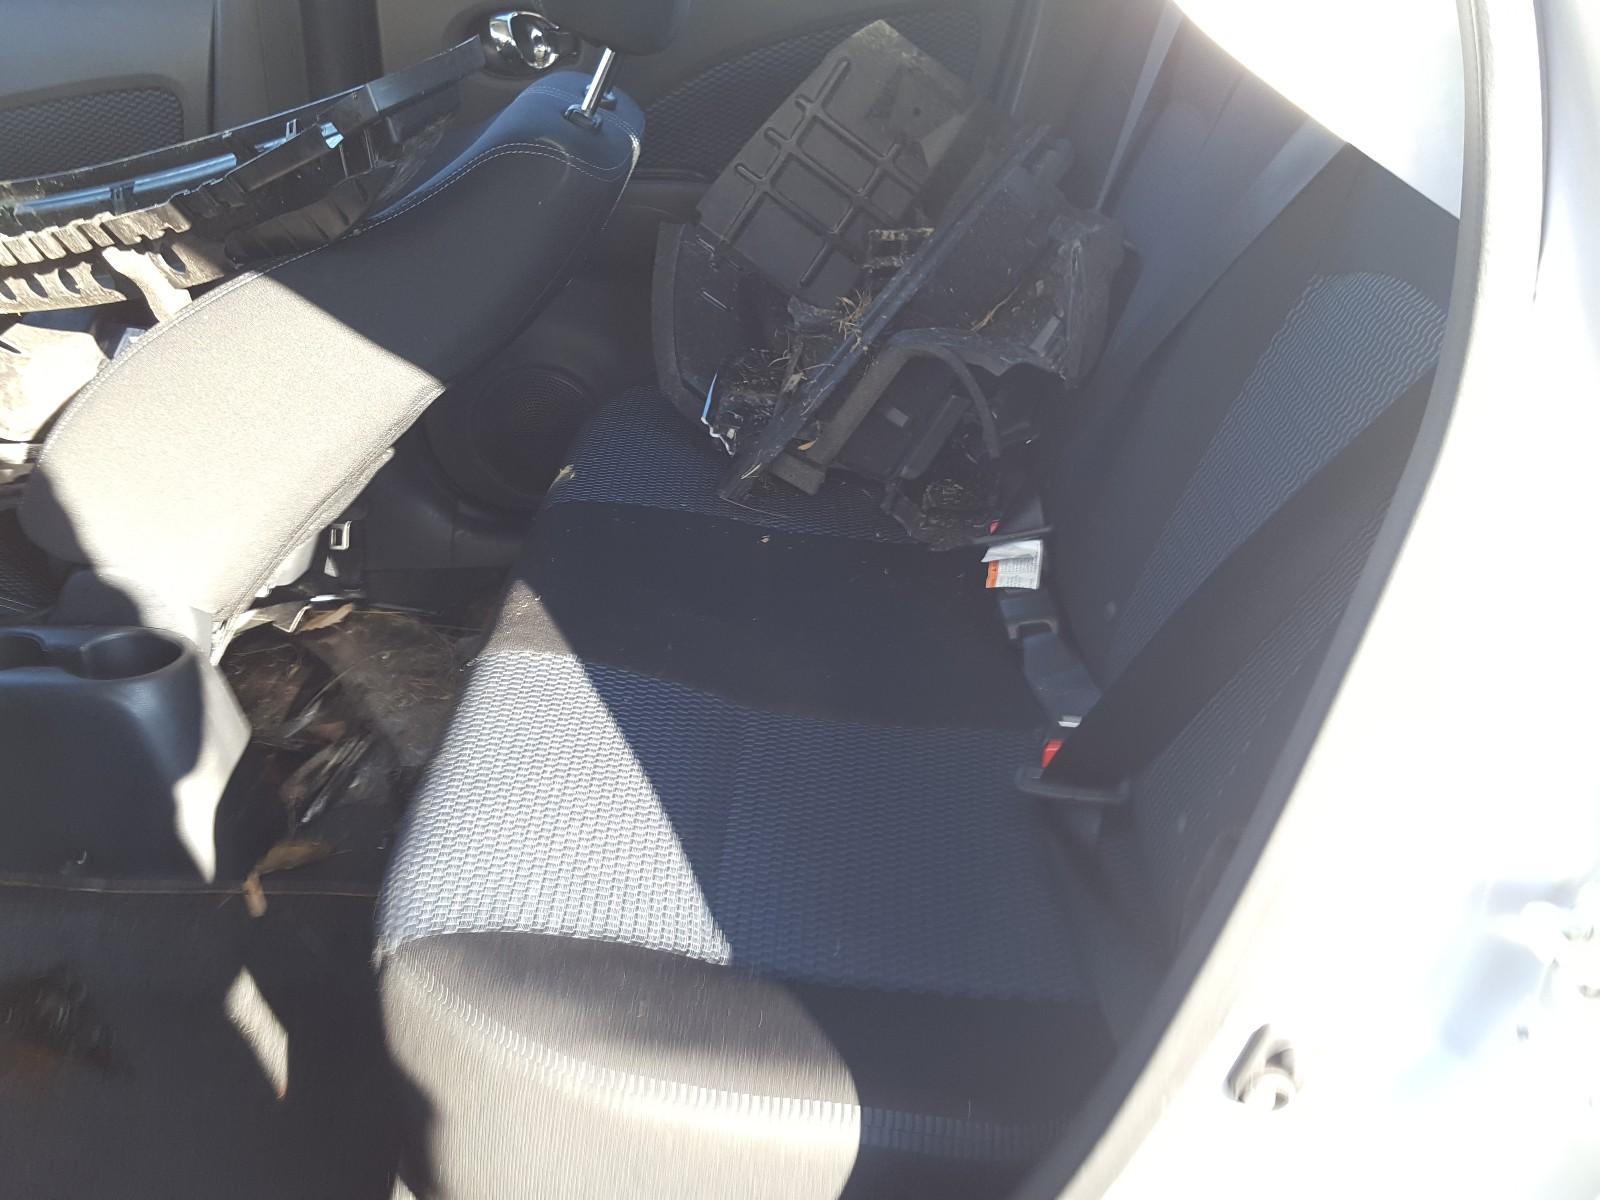 3N1CE2CP3KL358768 - 2019 Nissan Versa Note 1.6L detail view